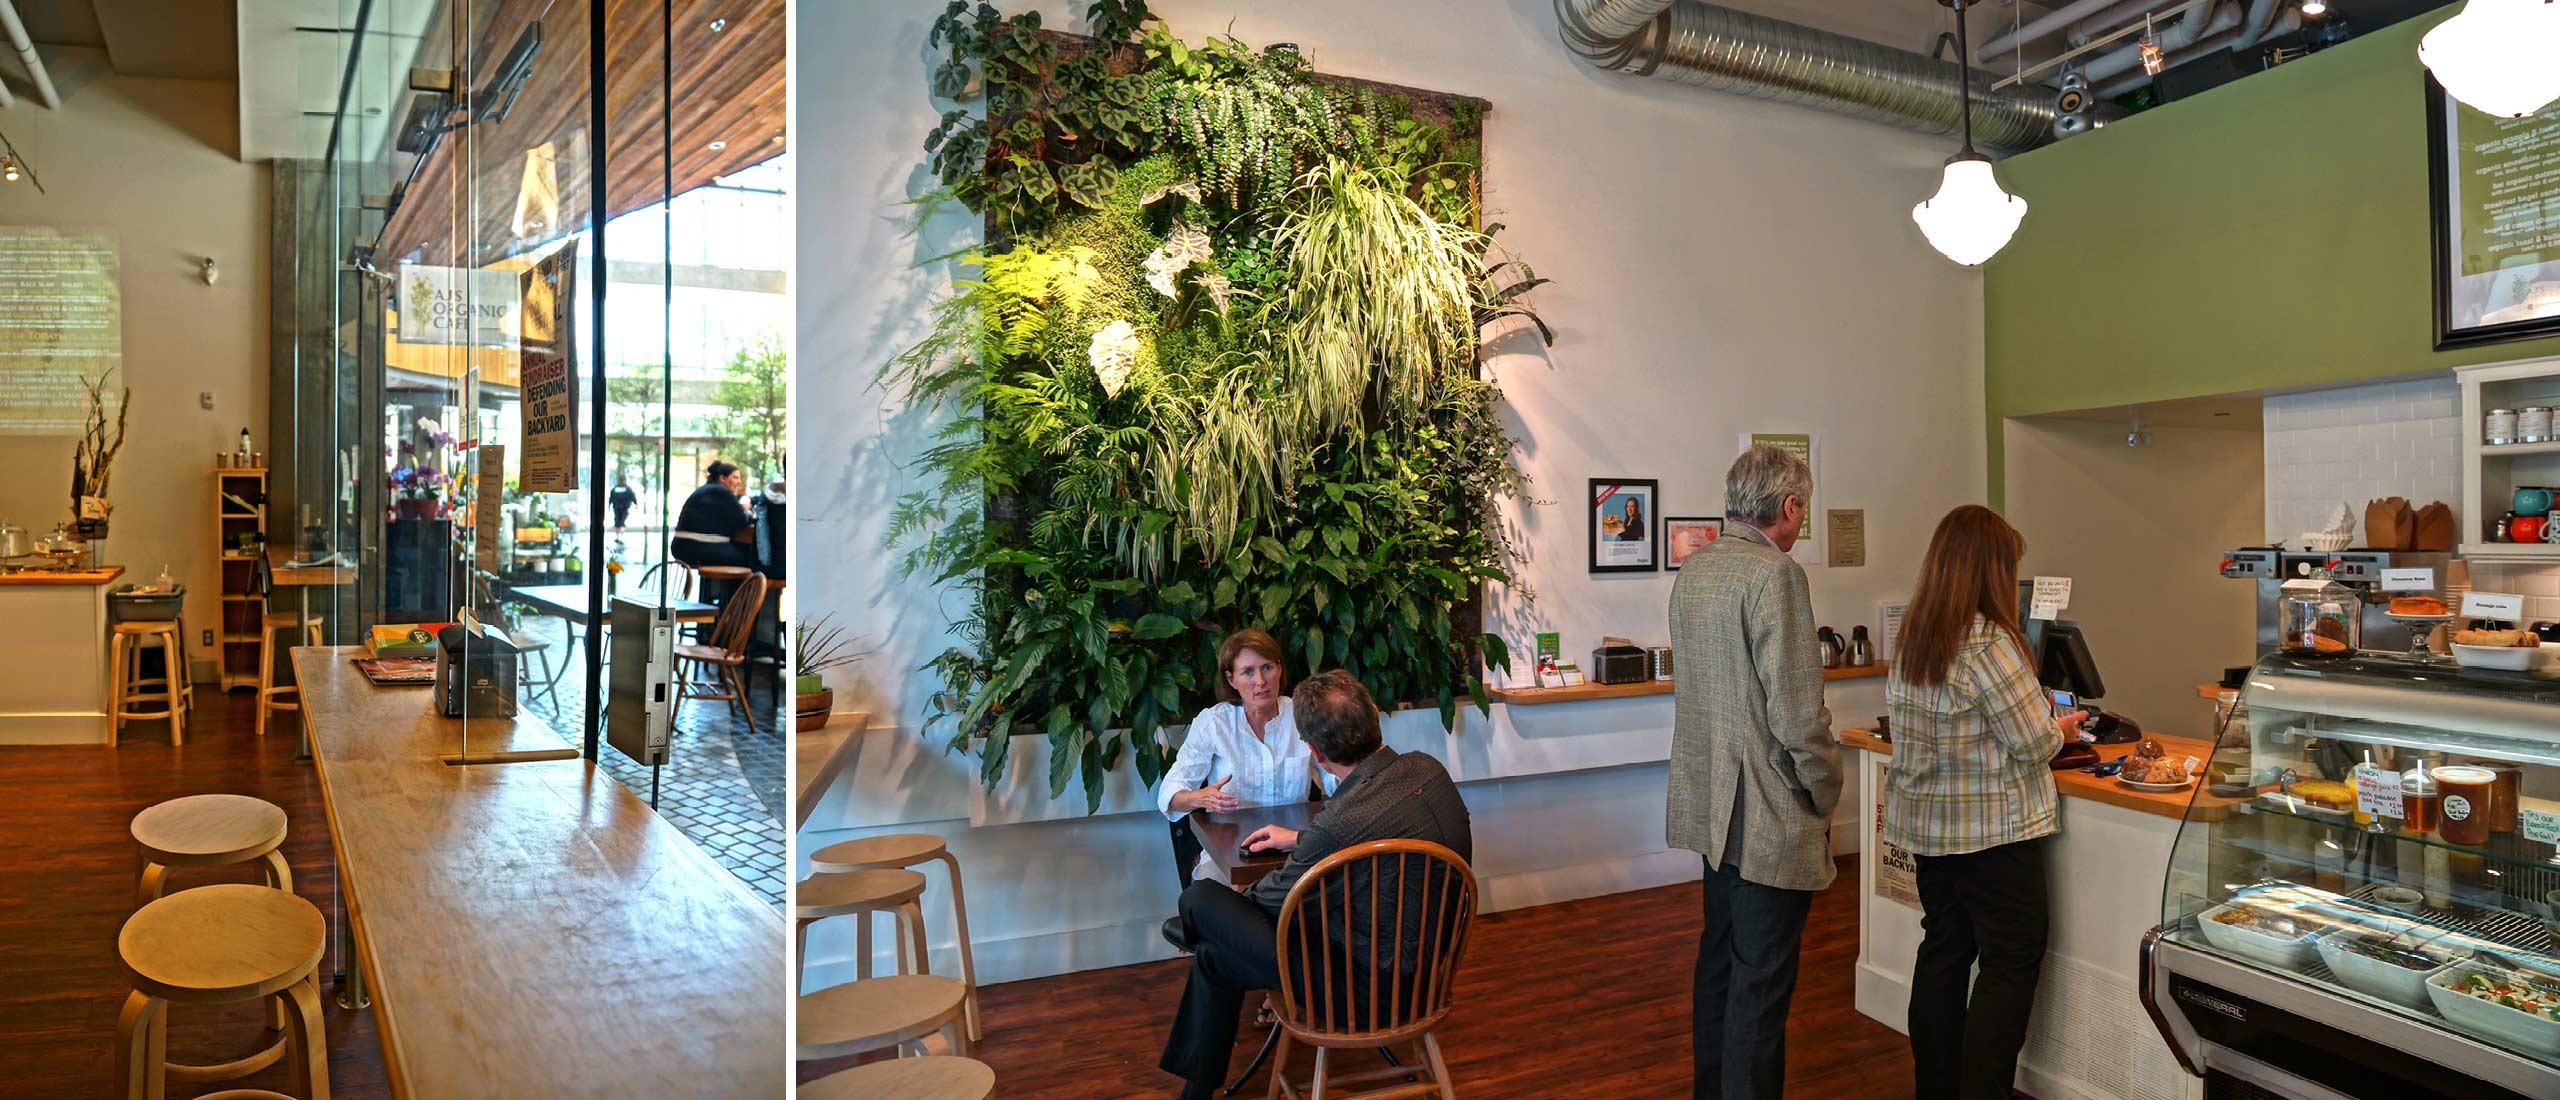 ajs organic cafe dambrosio architecture urbanism